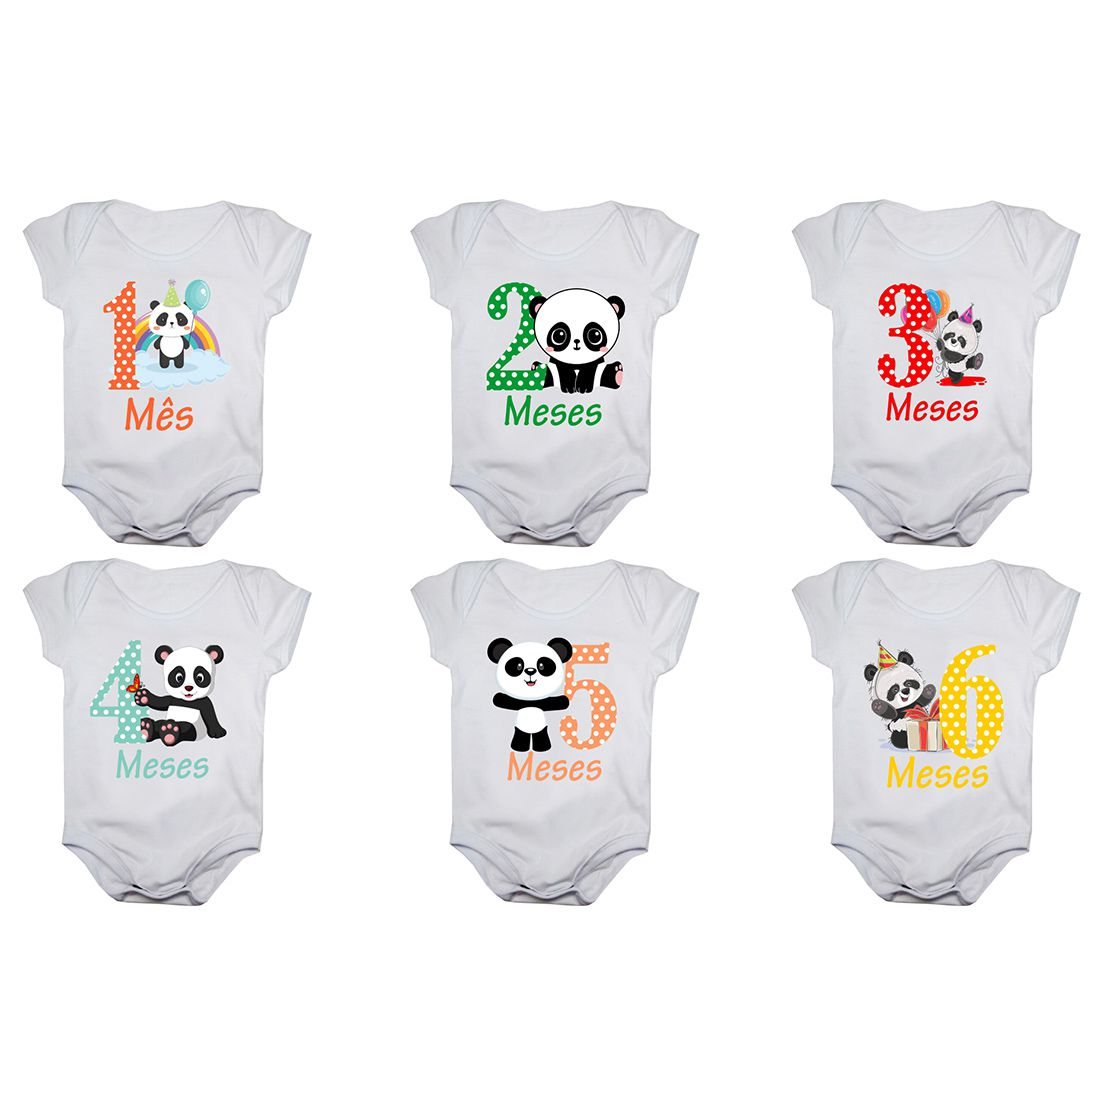 Kit body de bebê mesversario manga curta panda 12 bodies 1 a 12 meses